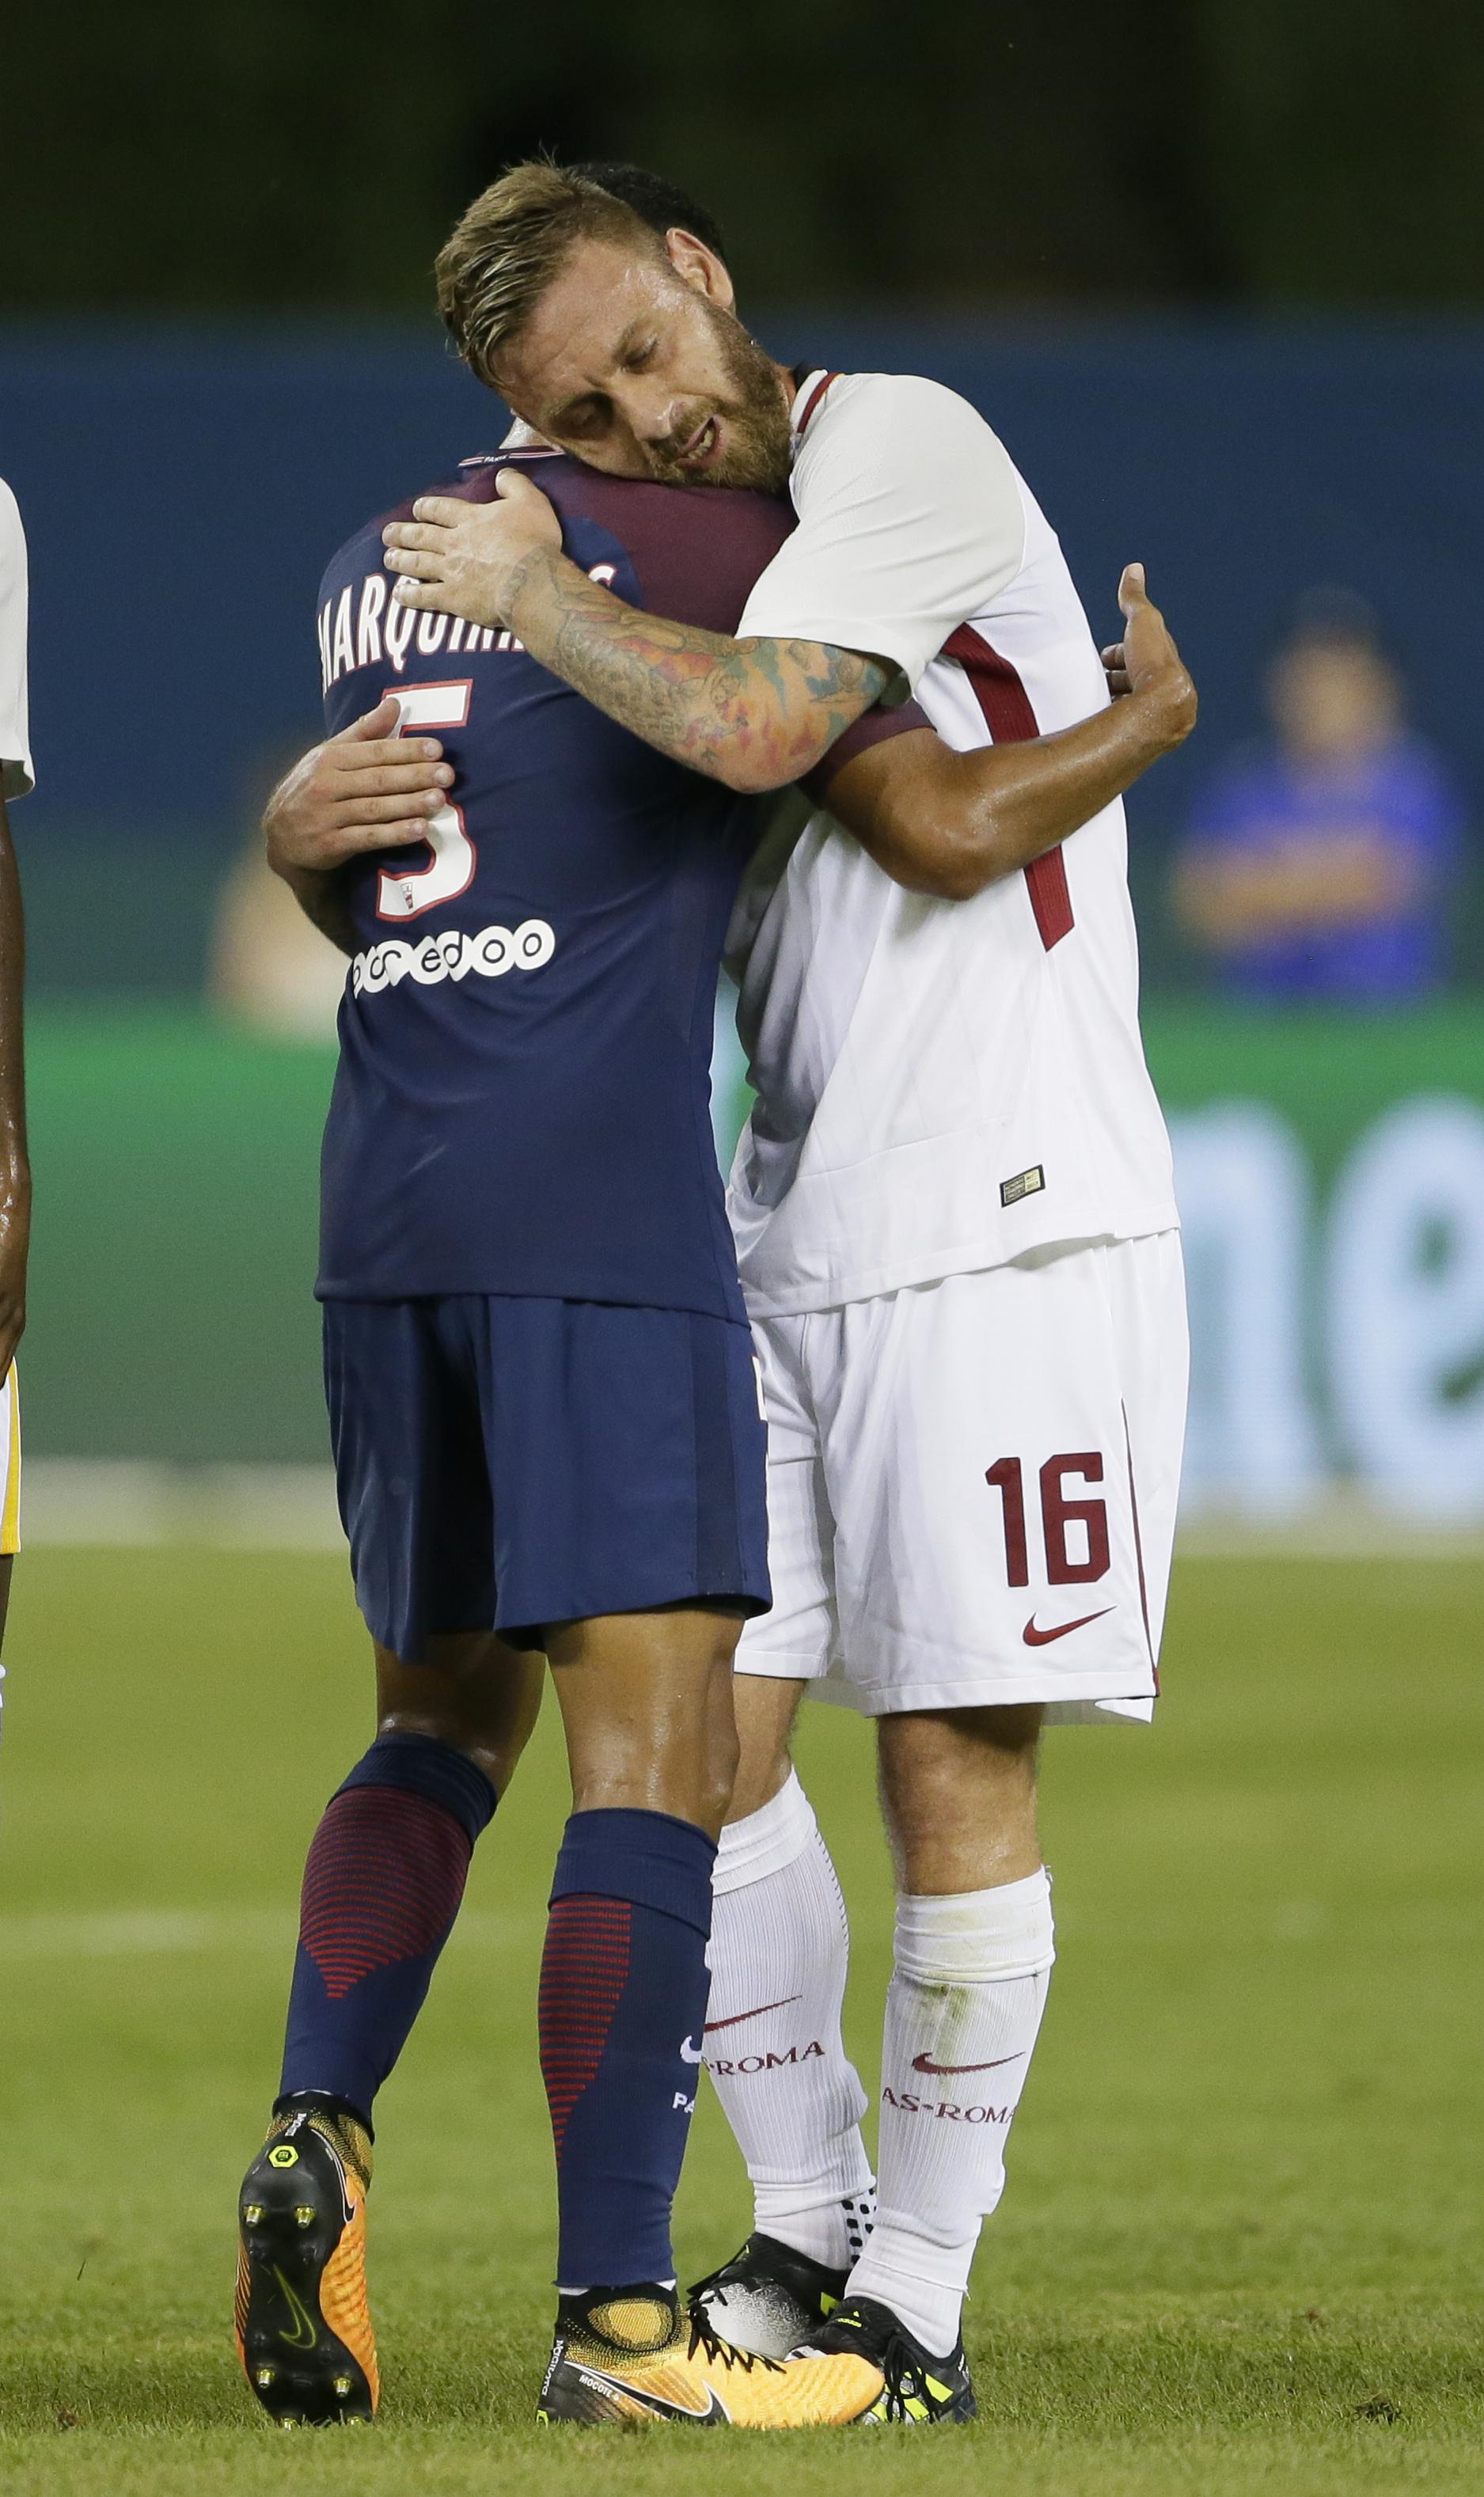 International Champions Cup 2017 - AS Roma v Paris Saint-Germain